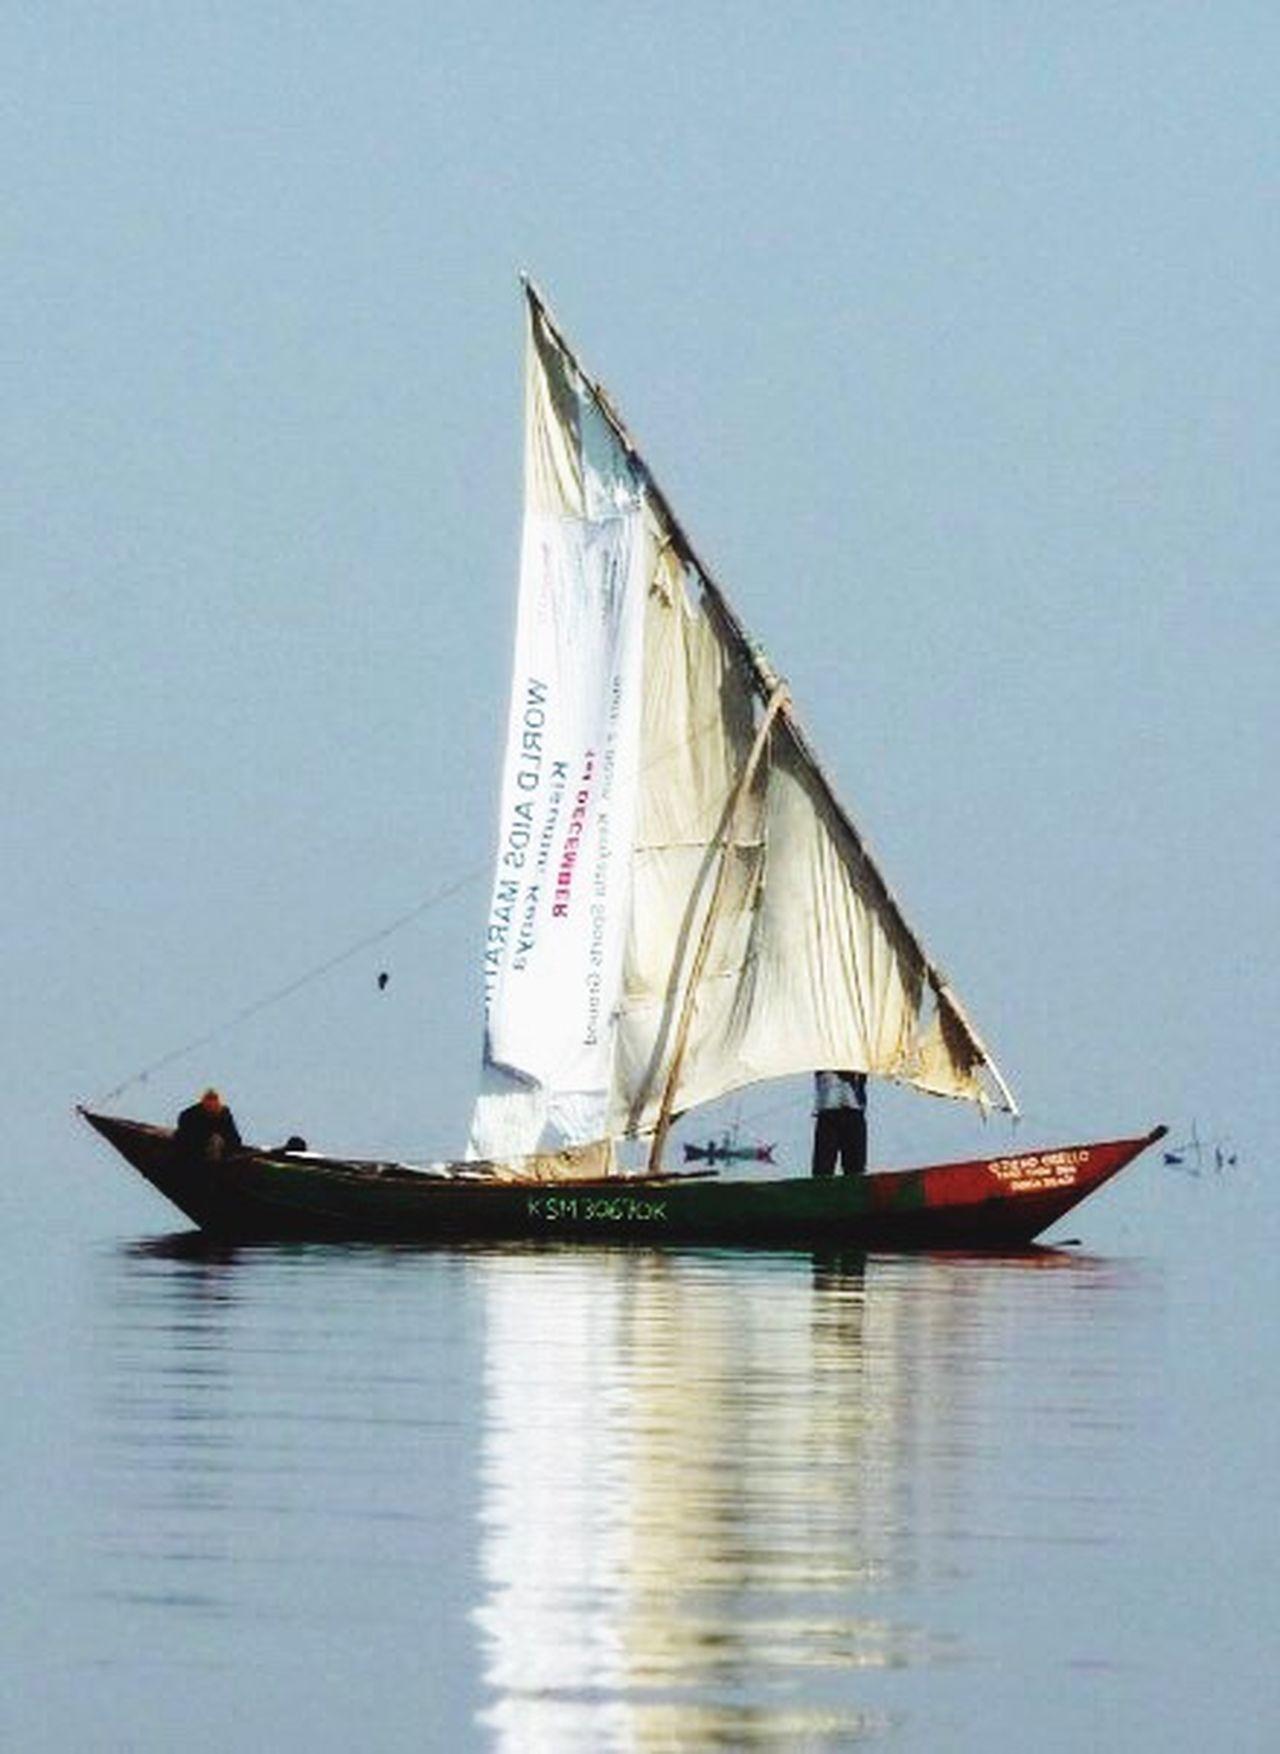 Nautical Vessel Transportation Sailing Mode Of Transport Sea Sailboat Water Outdoors Sky No People Day Sailor Kenya